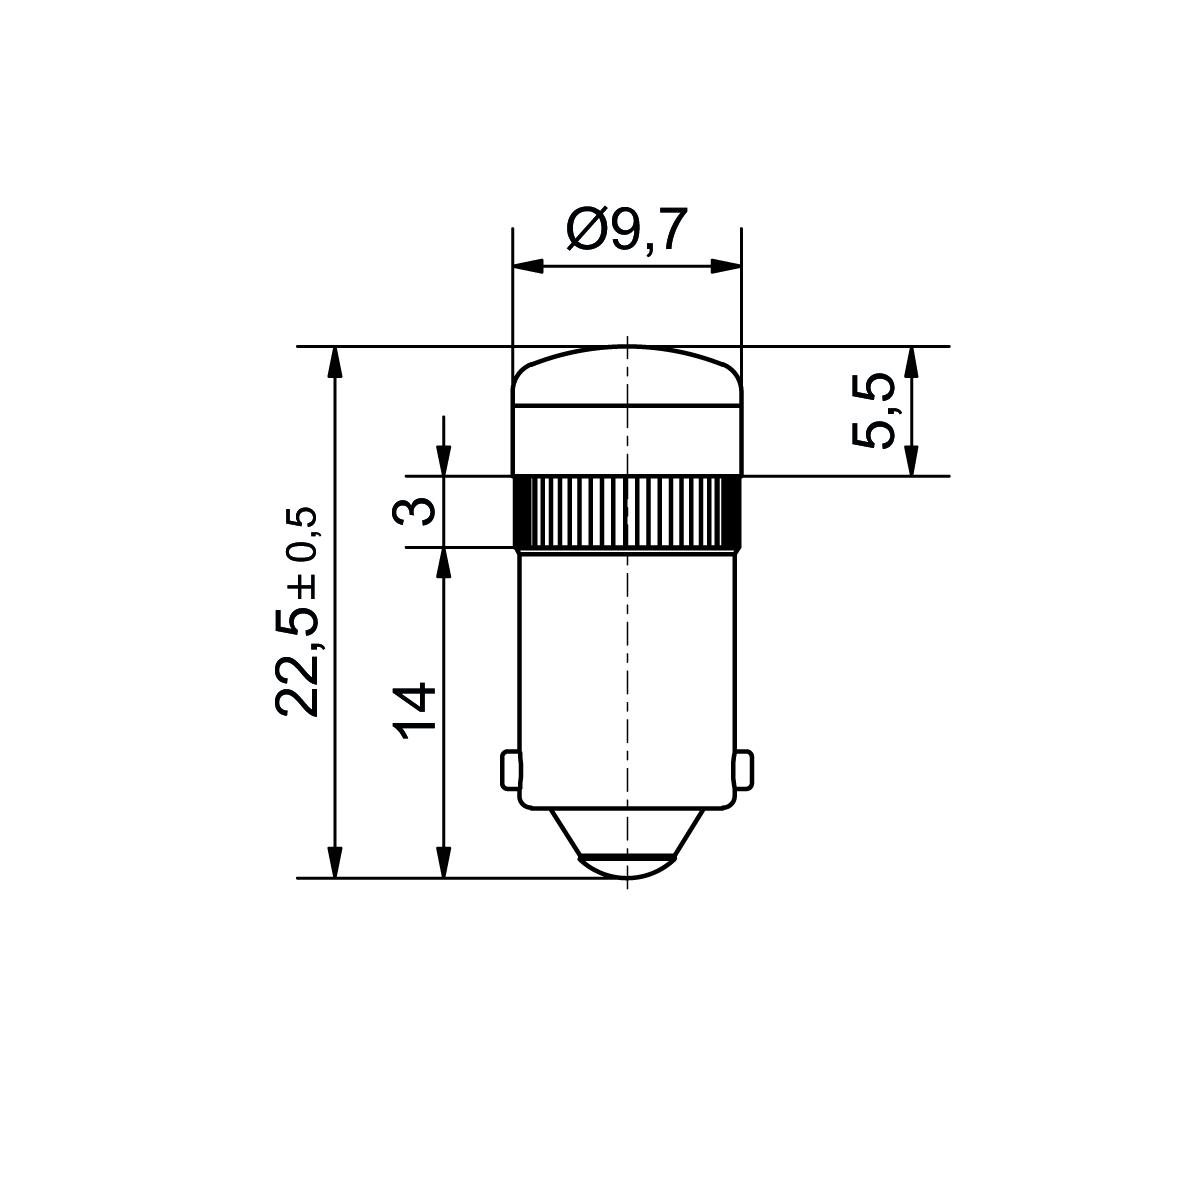 Multi-Look® LED lamp socket BA9s up to 60V AC/DC - plan